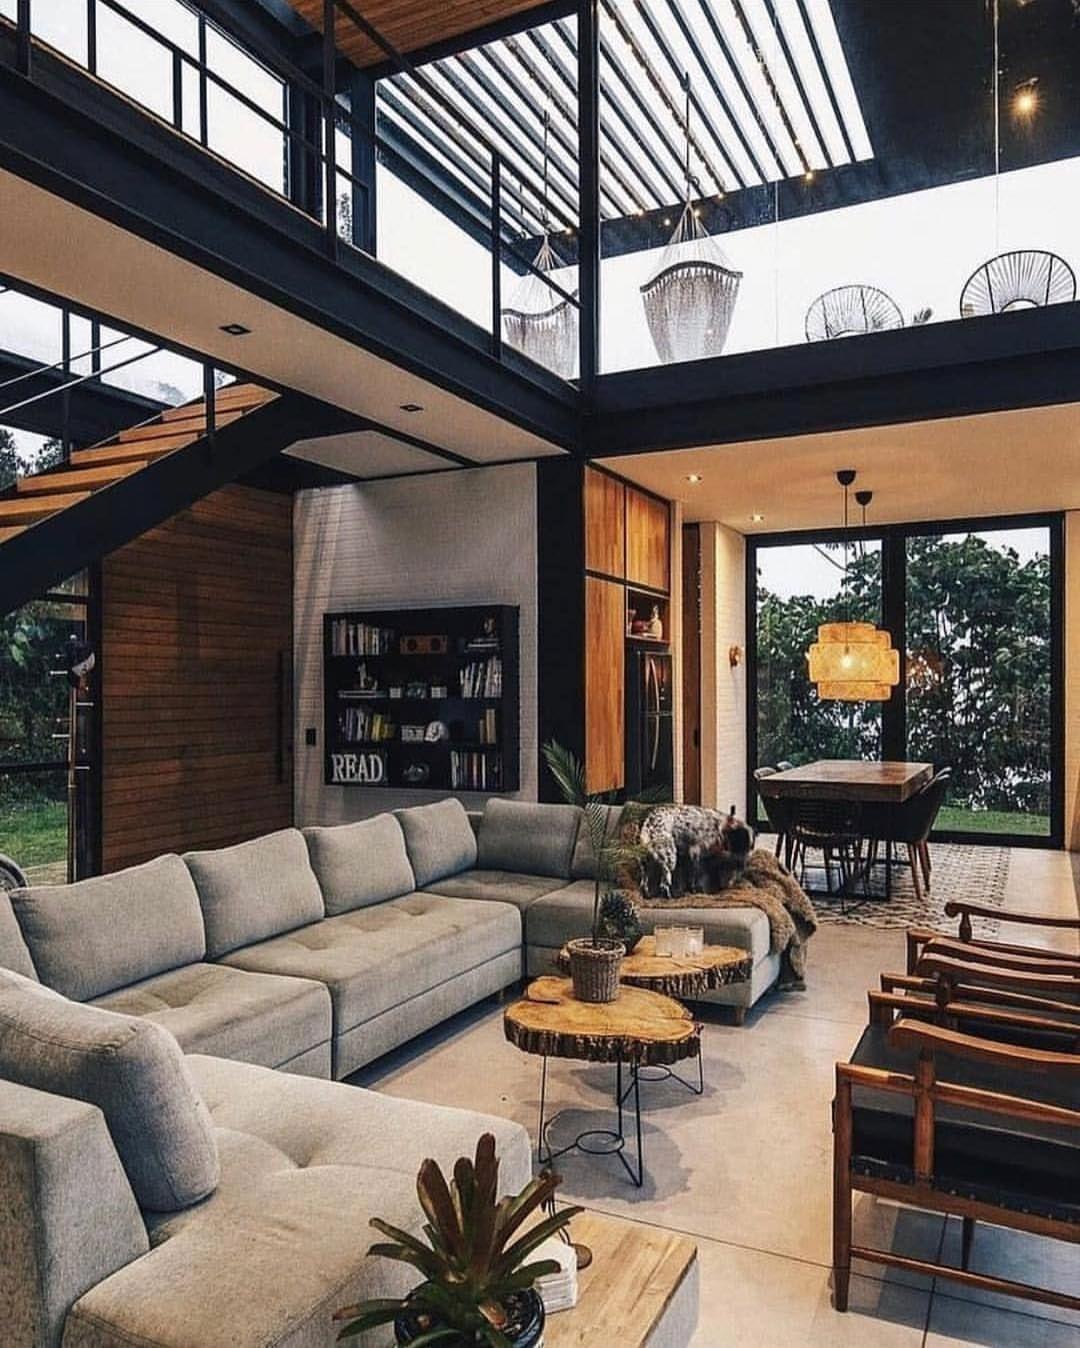 loft living room ideas upstairs  Loft interior design, Loft